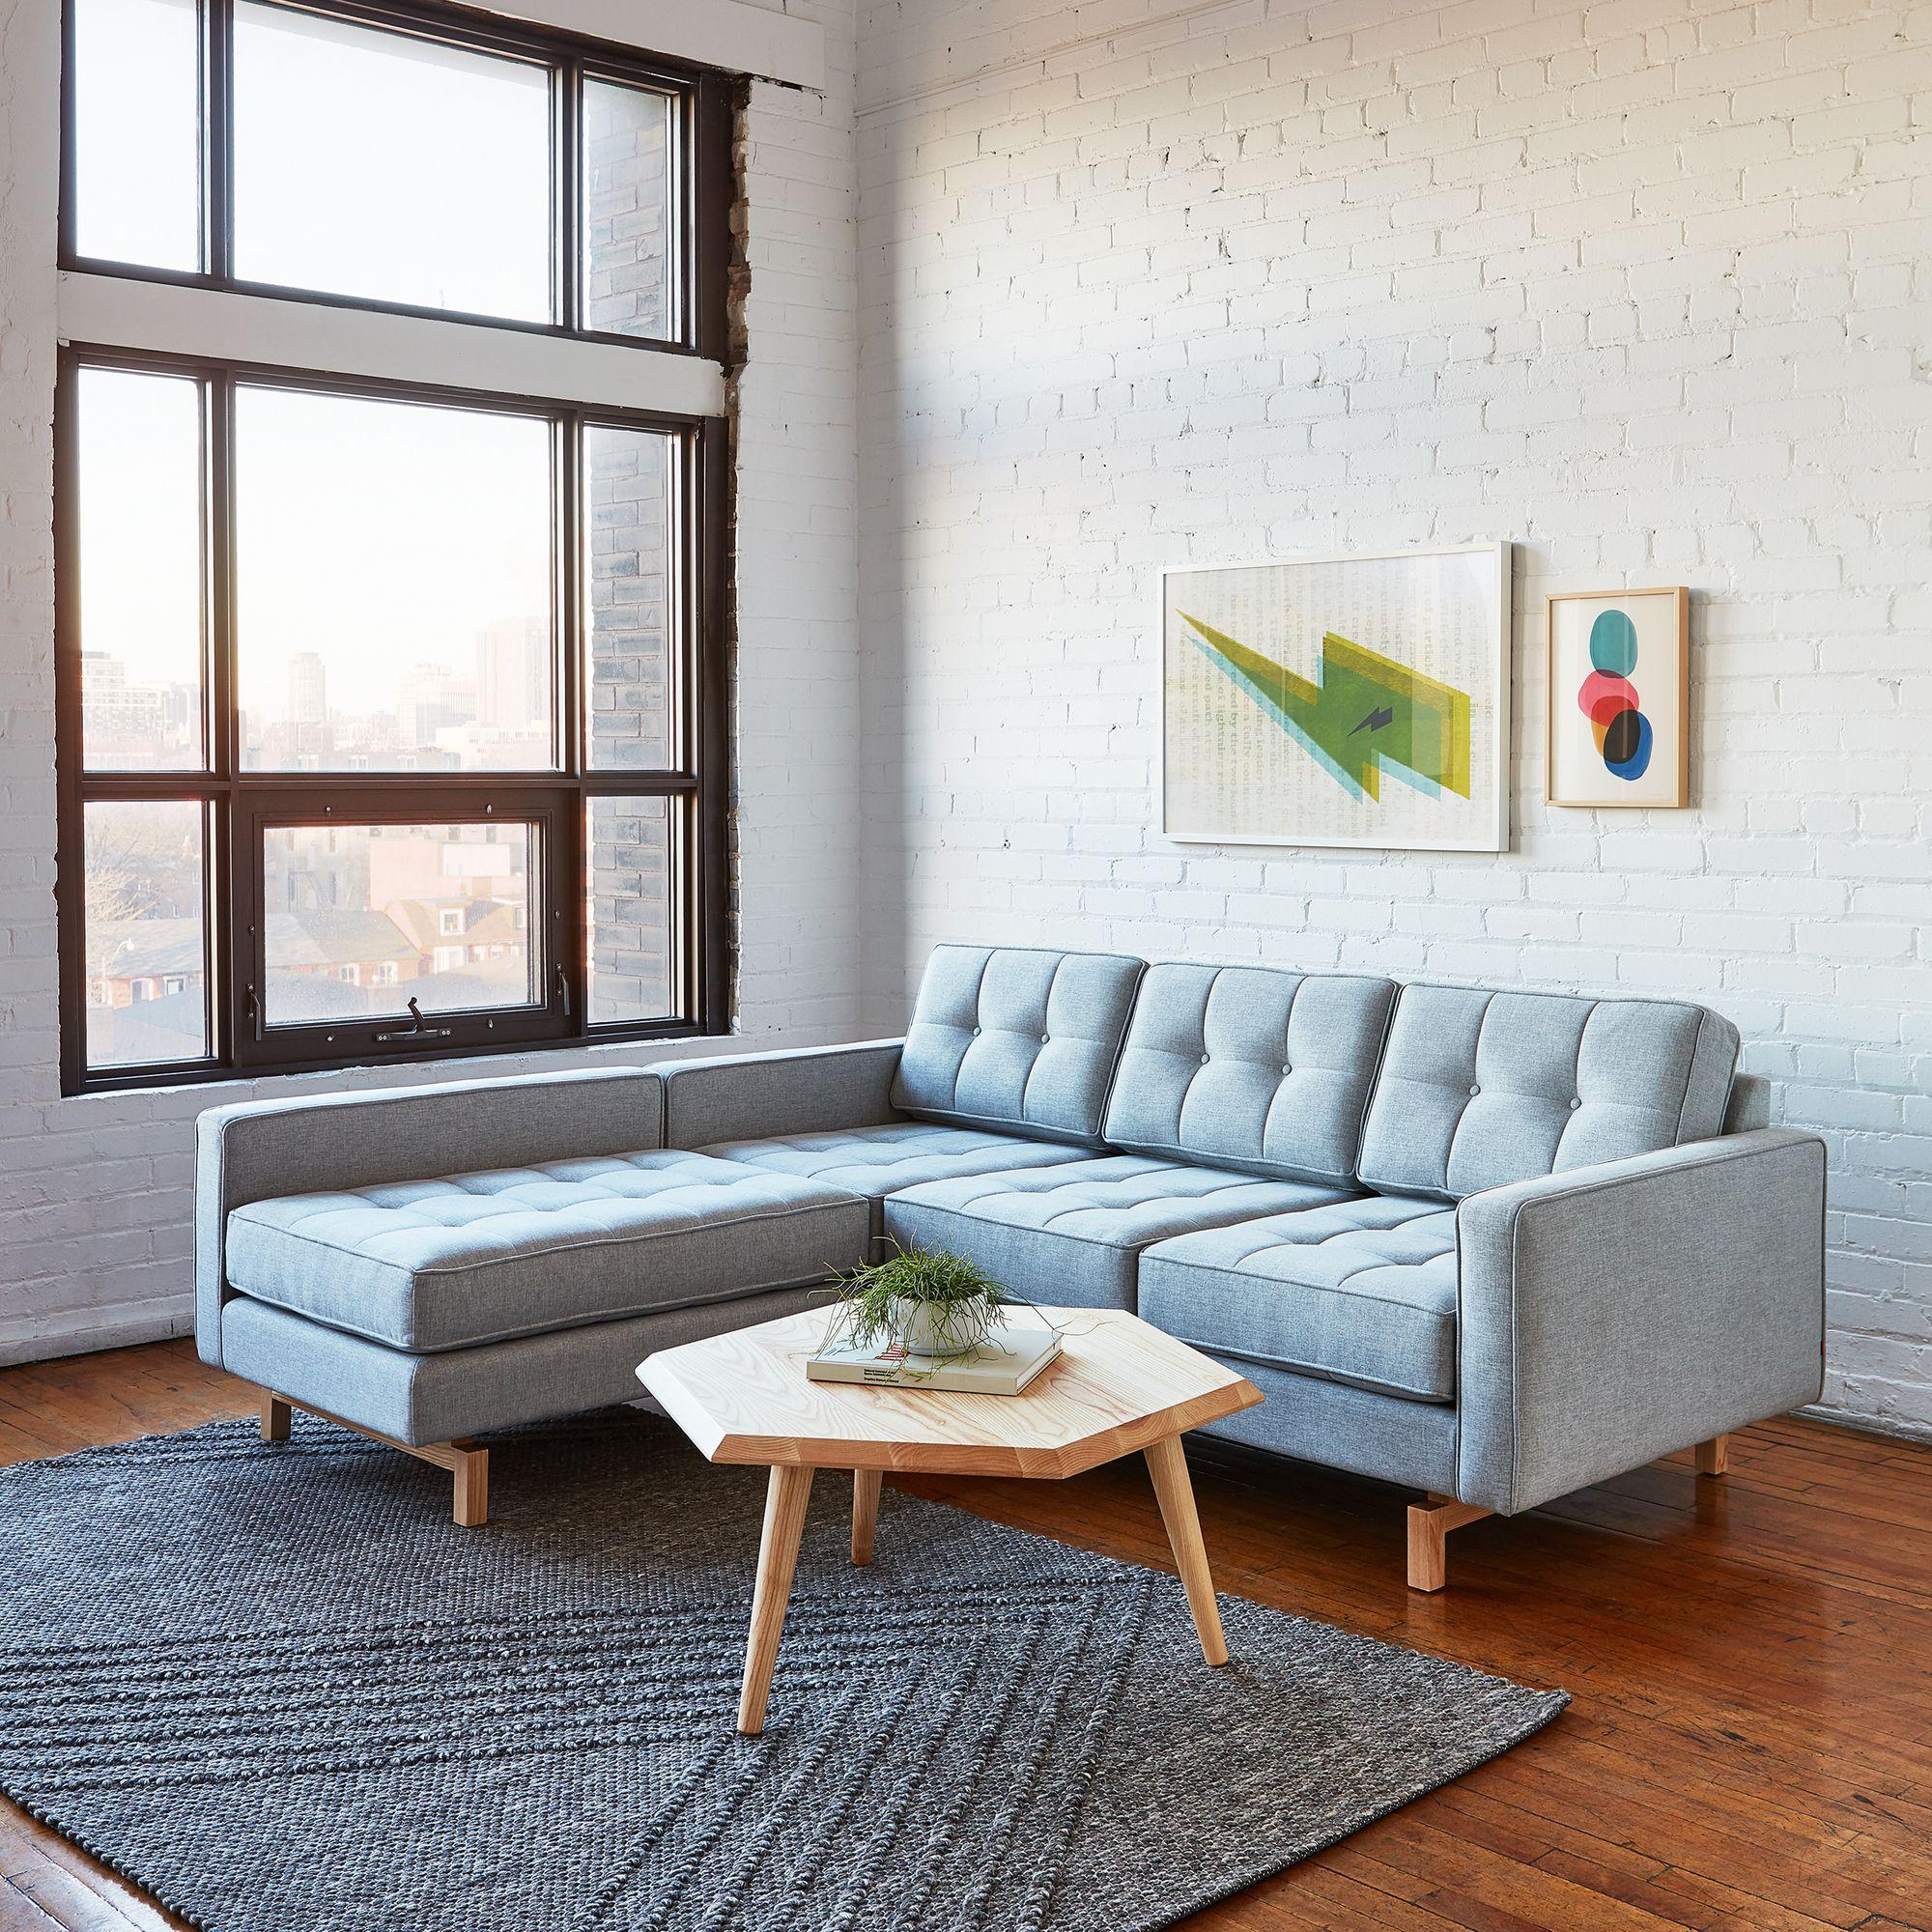 Jane 2 Bi Sectional Furniture Home Decor Gus Modern Furniture